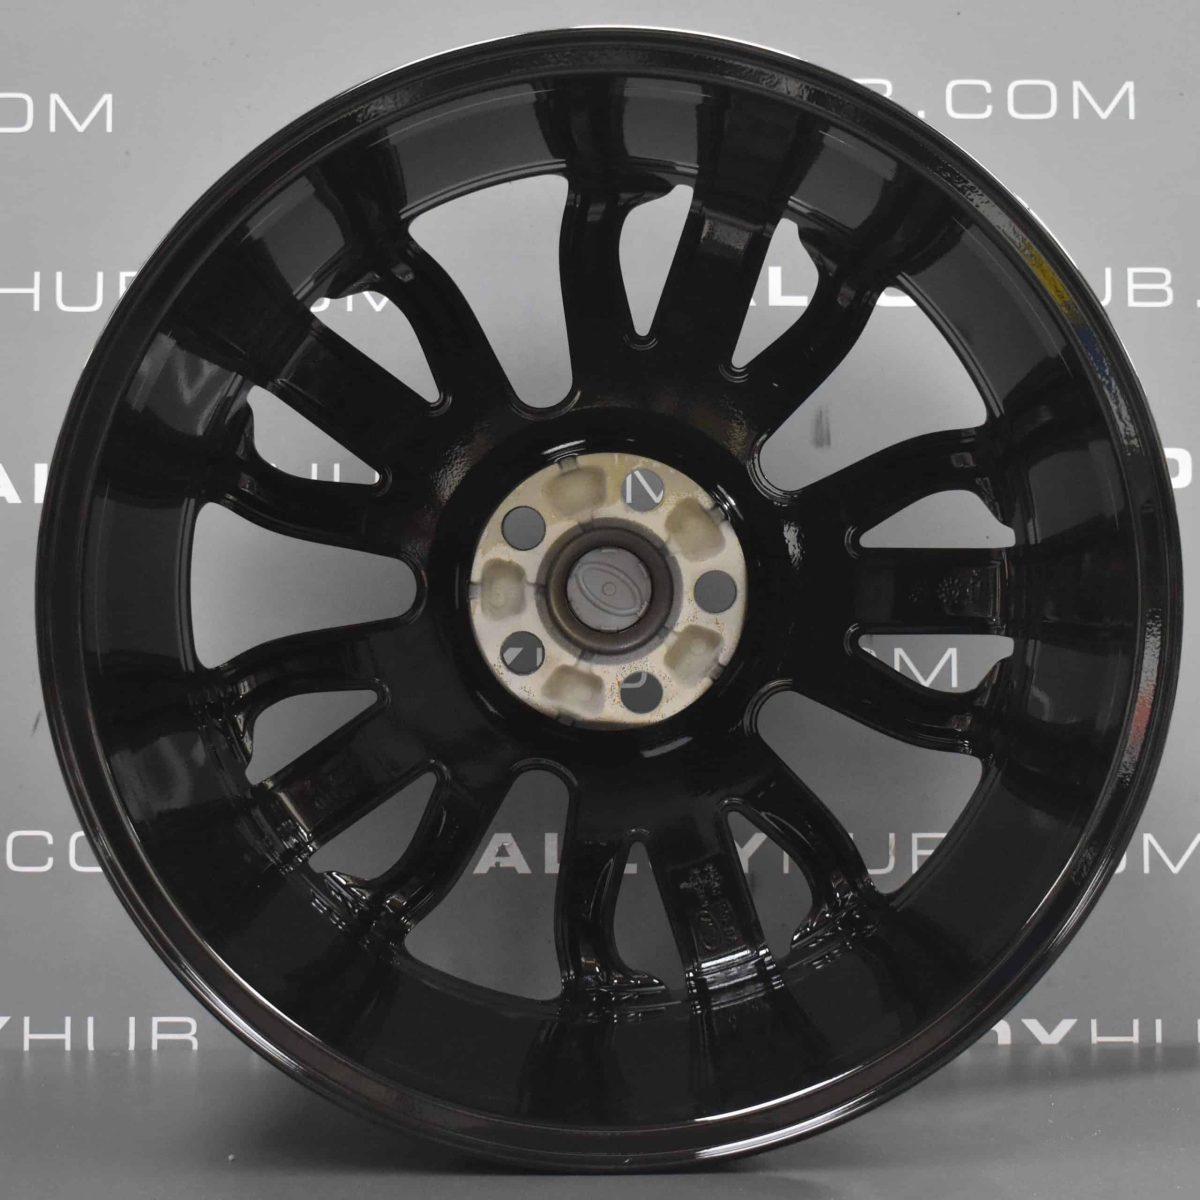 "Genuine Land Rover Range Rover Style 5007 21"" inch 5 Split-Spoke Gloss Black Forged Alloy Wheels VPLWW0091"